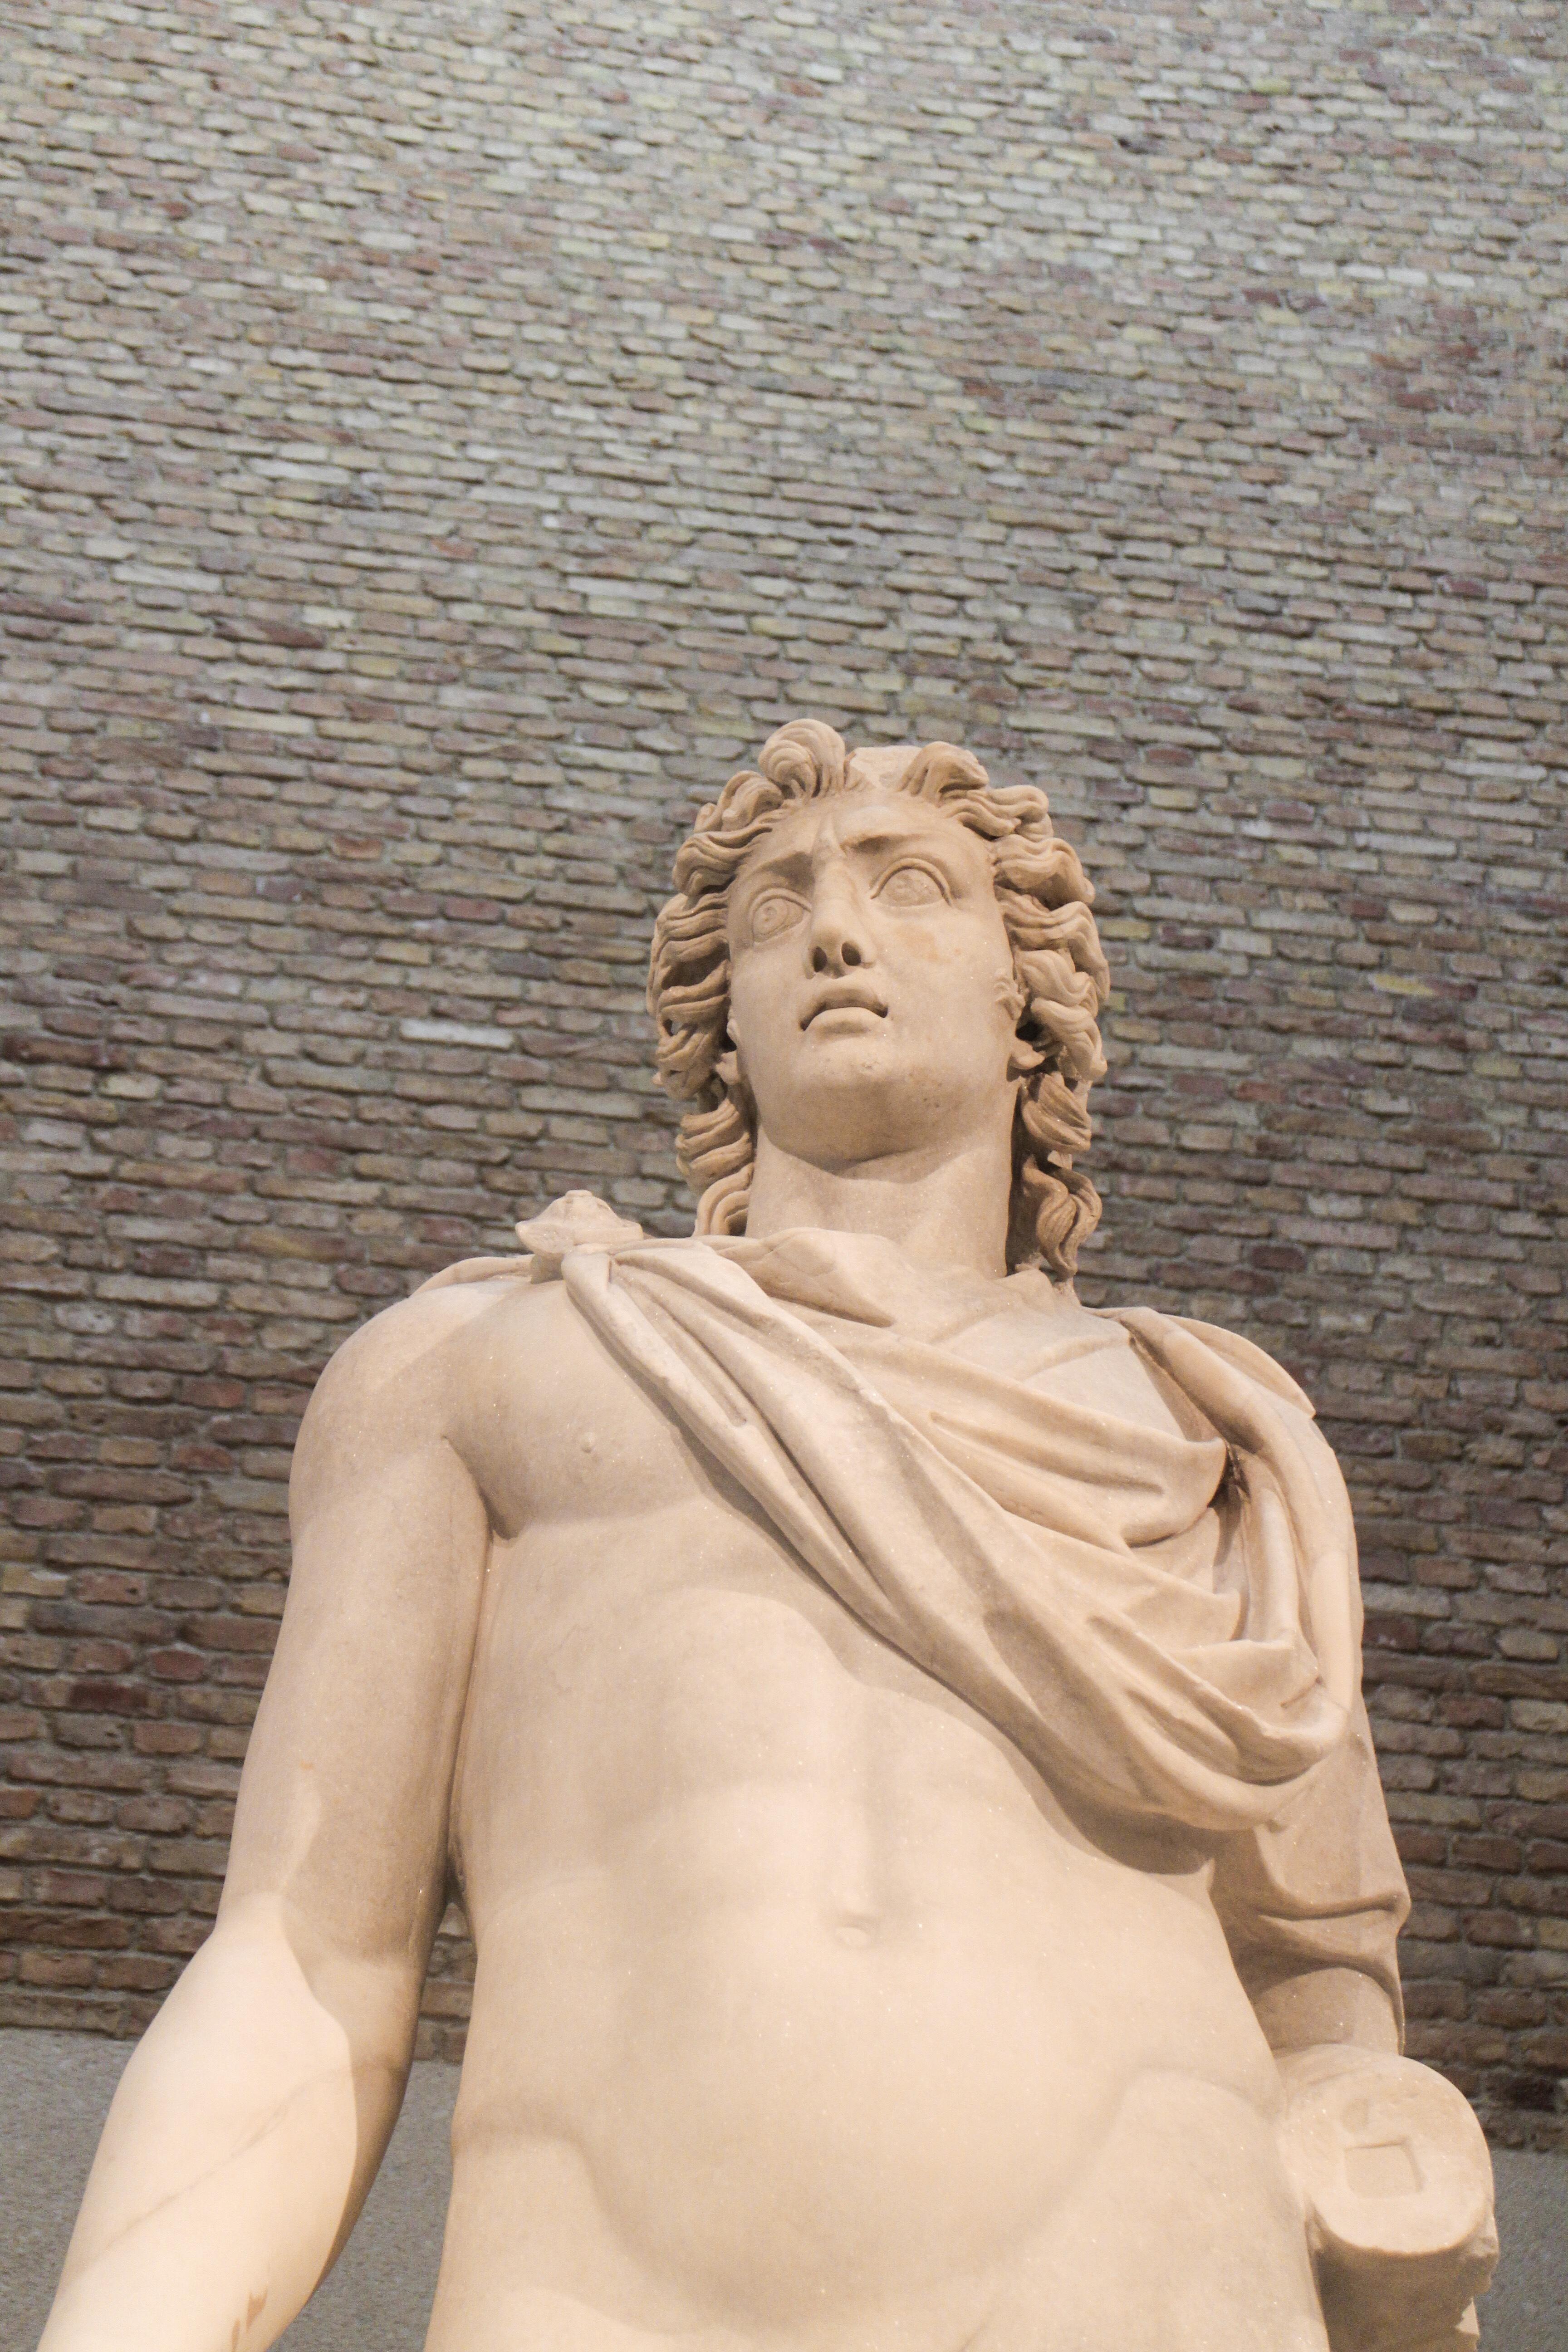 A statue of a Roman God